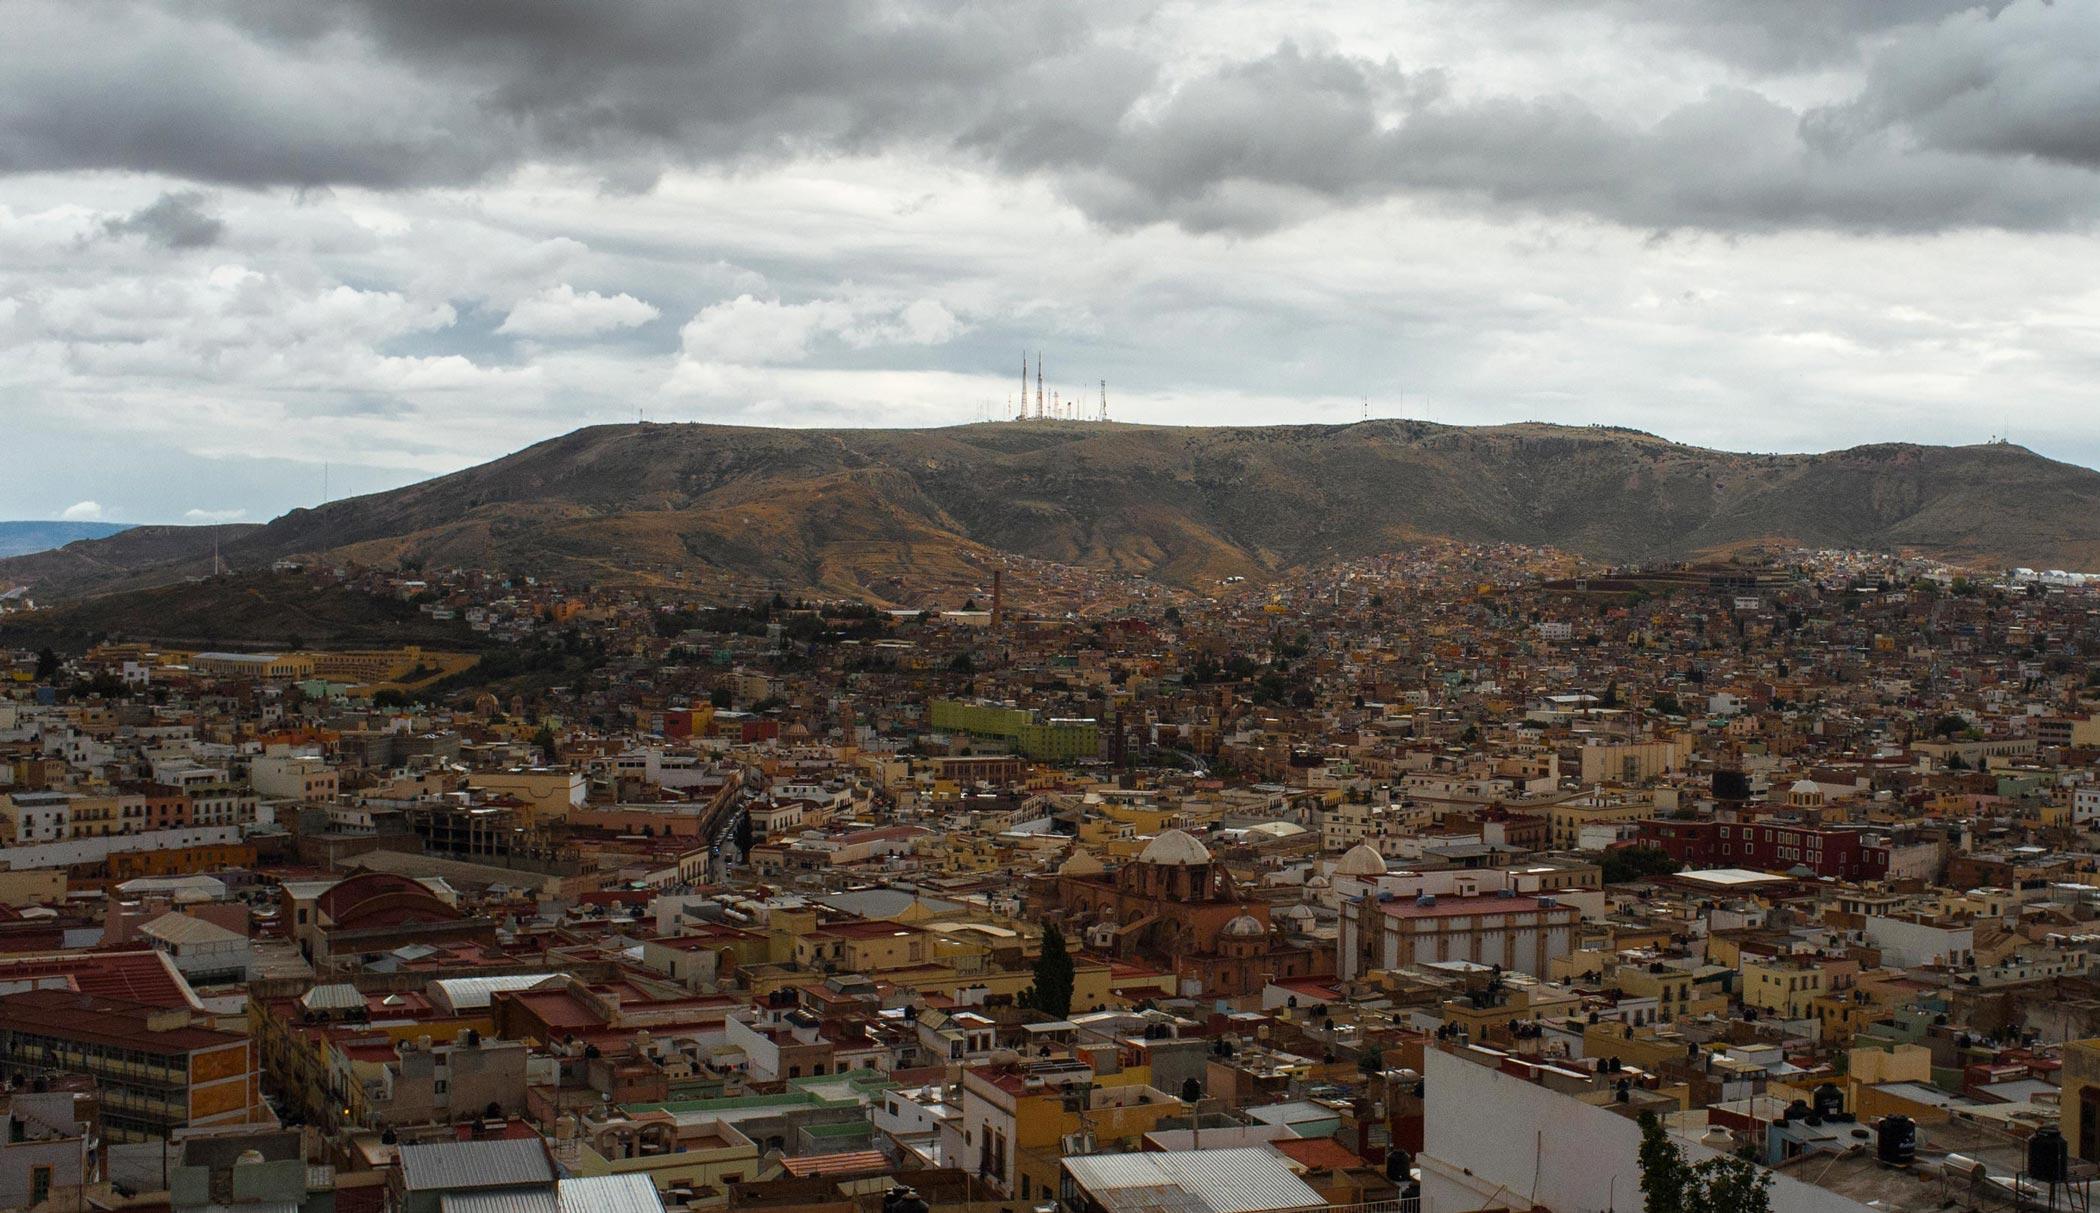 A hilltop view across the city of Zacatecas, Mexico